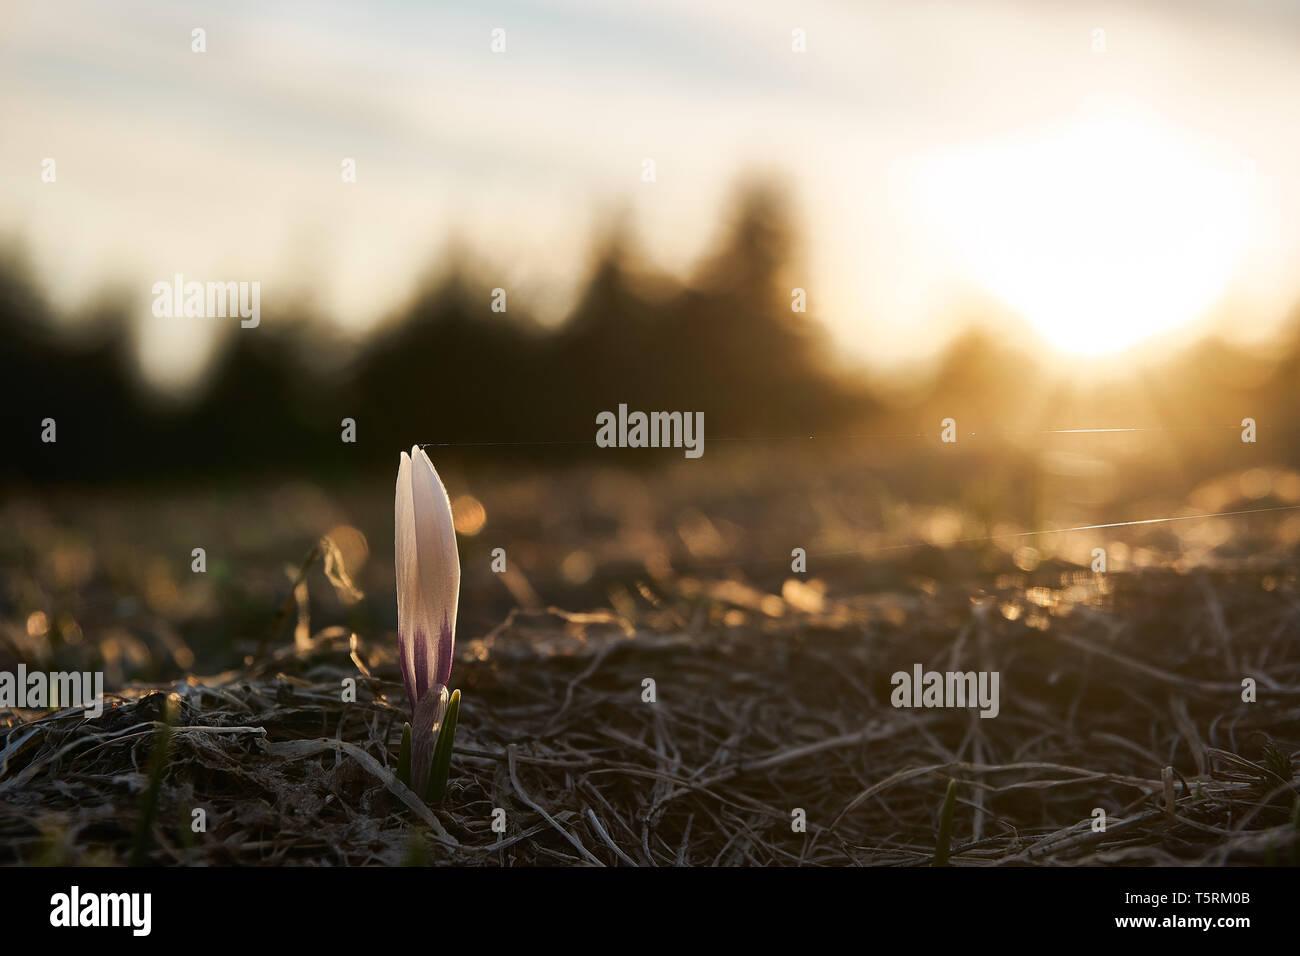 Die Blume im Frühling | Nahaufnahme - Stock Image